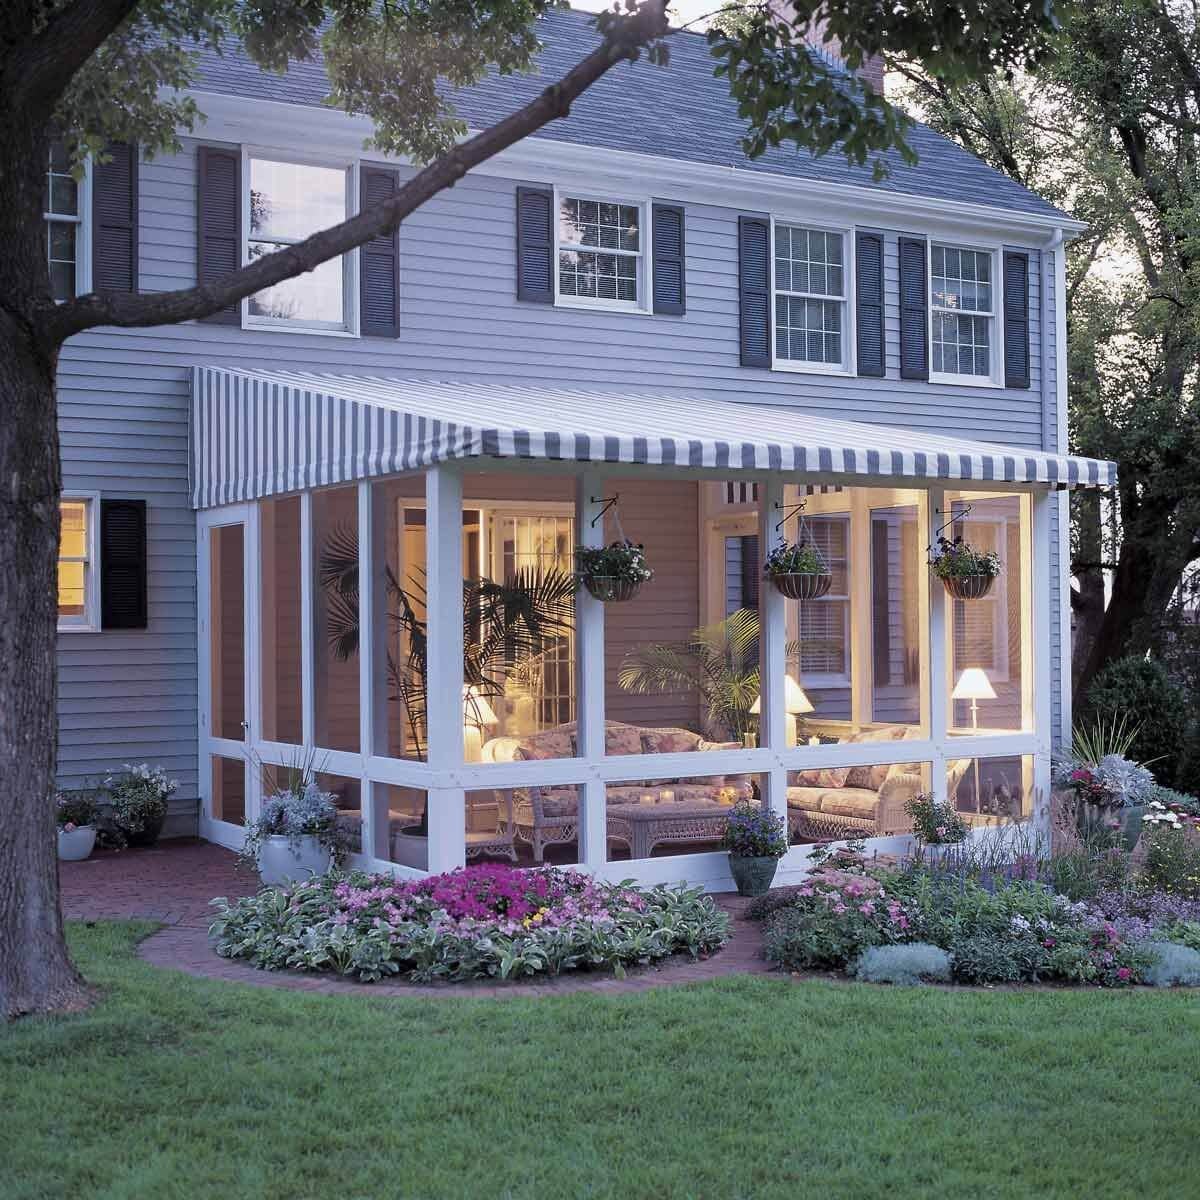 How to enclose a porch cheaply